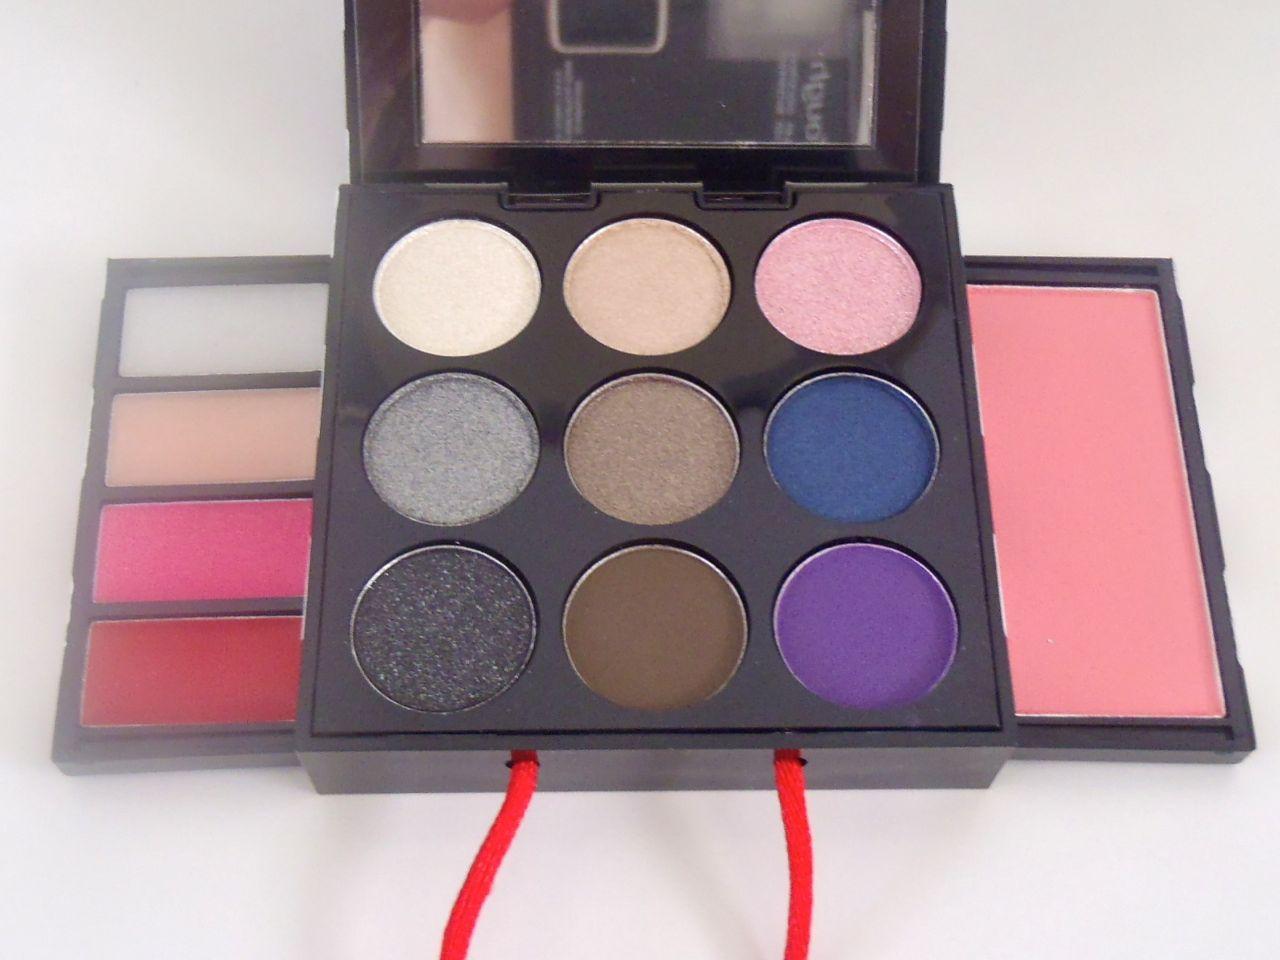 sephora mini makeup palette review mugeek vidalondon